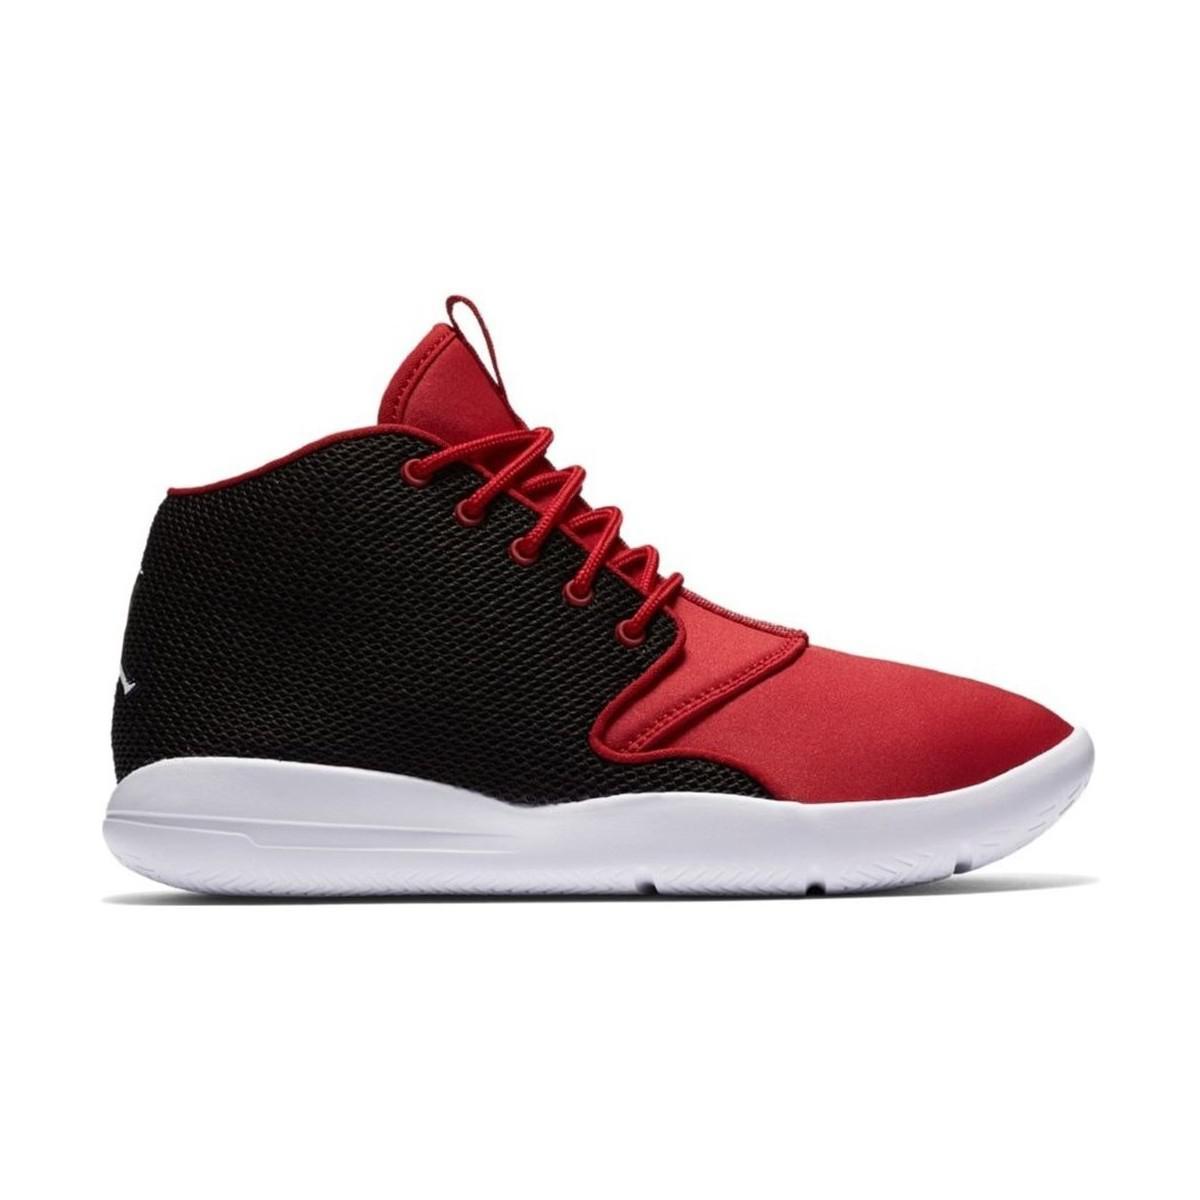 Nike Air Jordan Eclipse Chukka Bg Women s Shoes (high-top Trainers ... 89f8752750